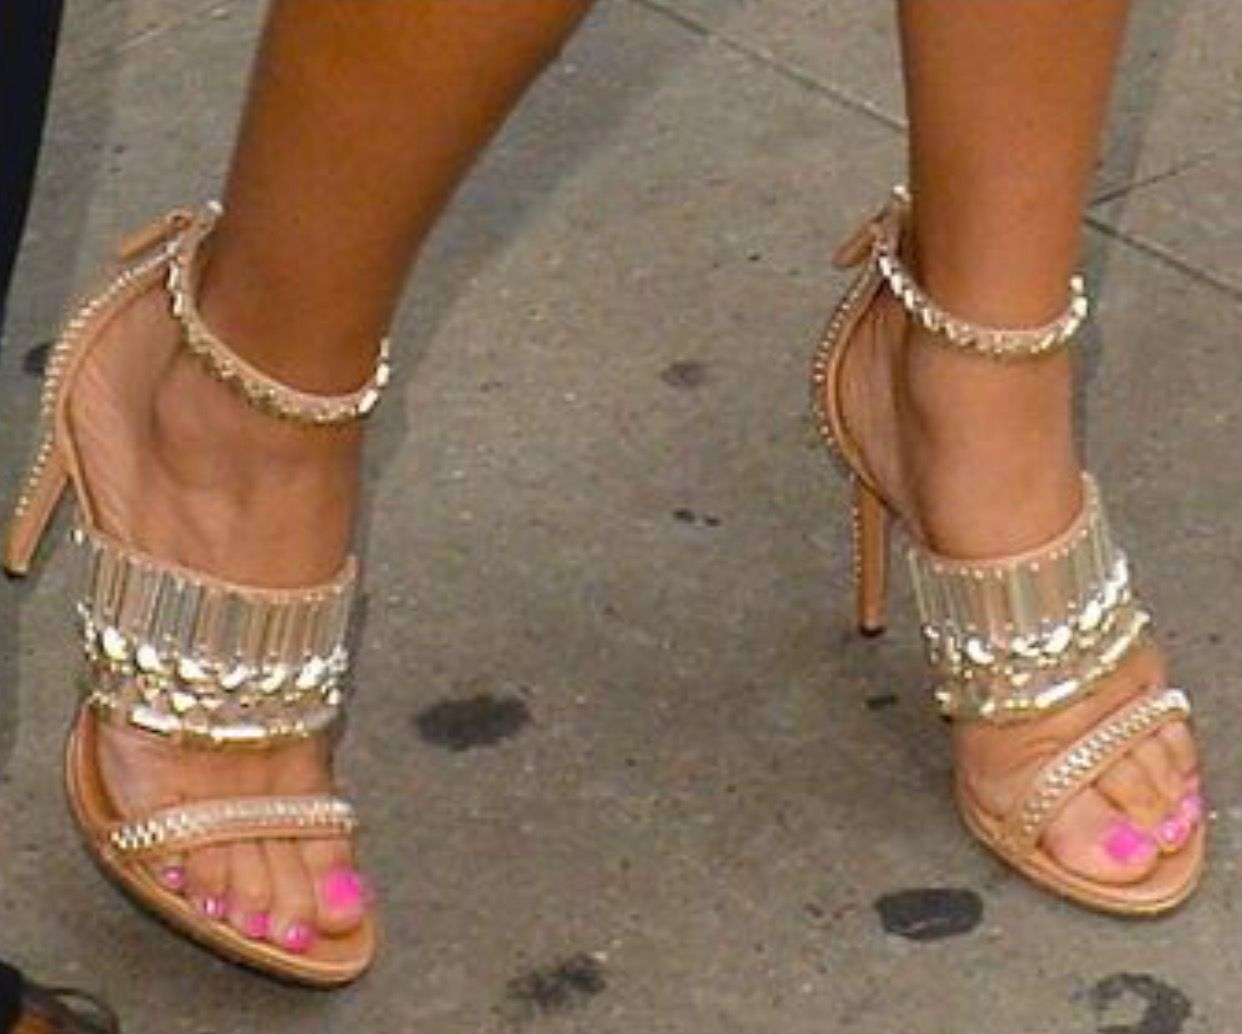 Andi Dorfman Feet photo 12